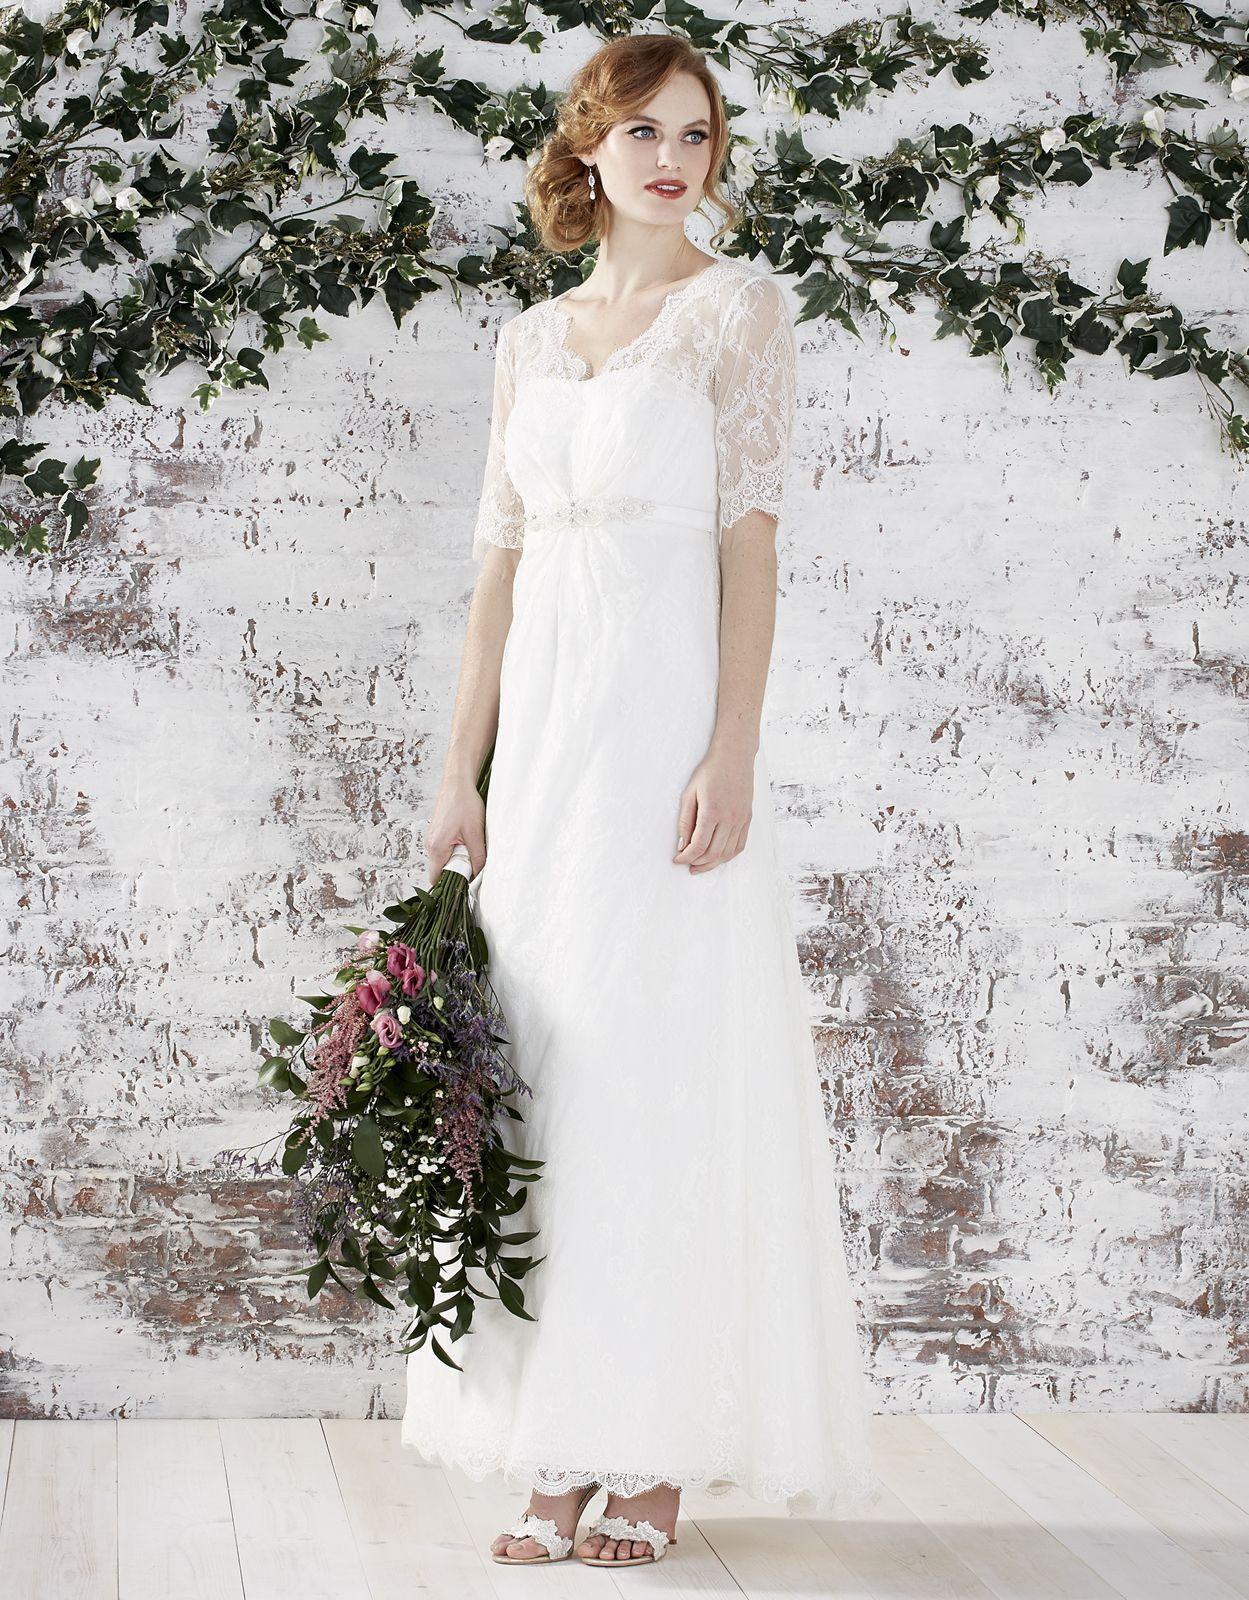 Nevena bridal dress wedding dresses pinterest bridal dresses nevena bridal dress ombrellifo Gallery